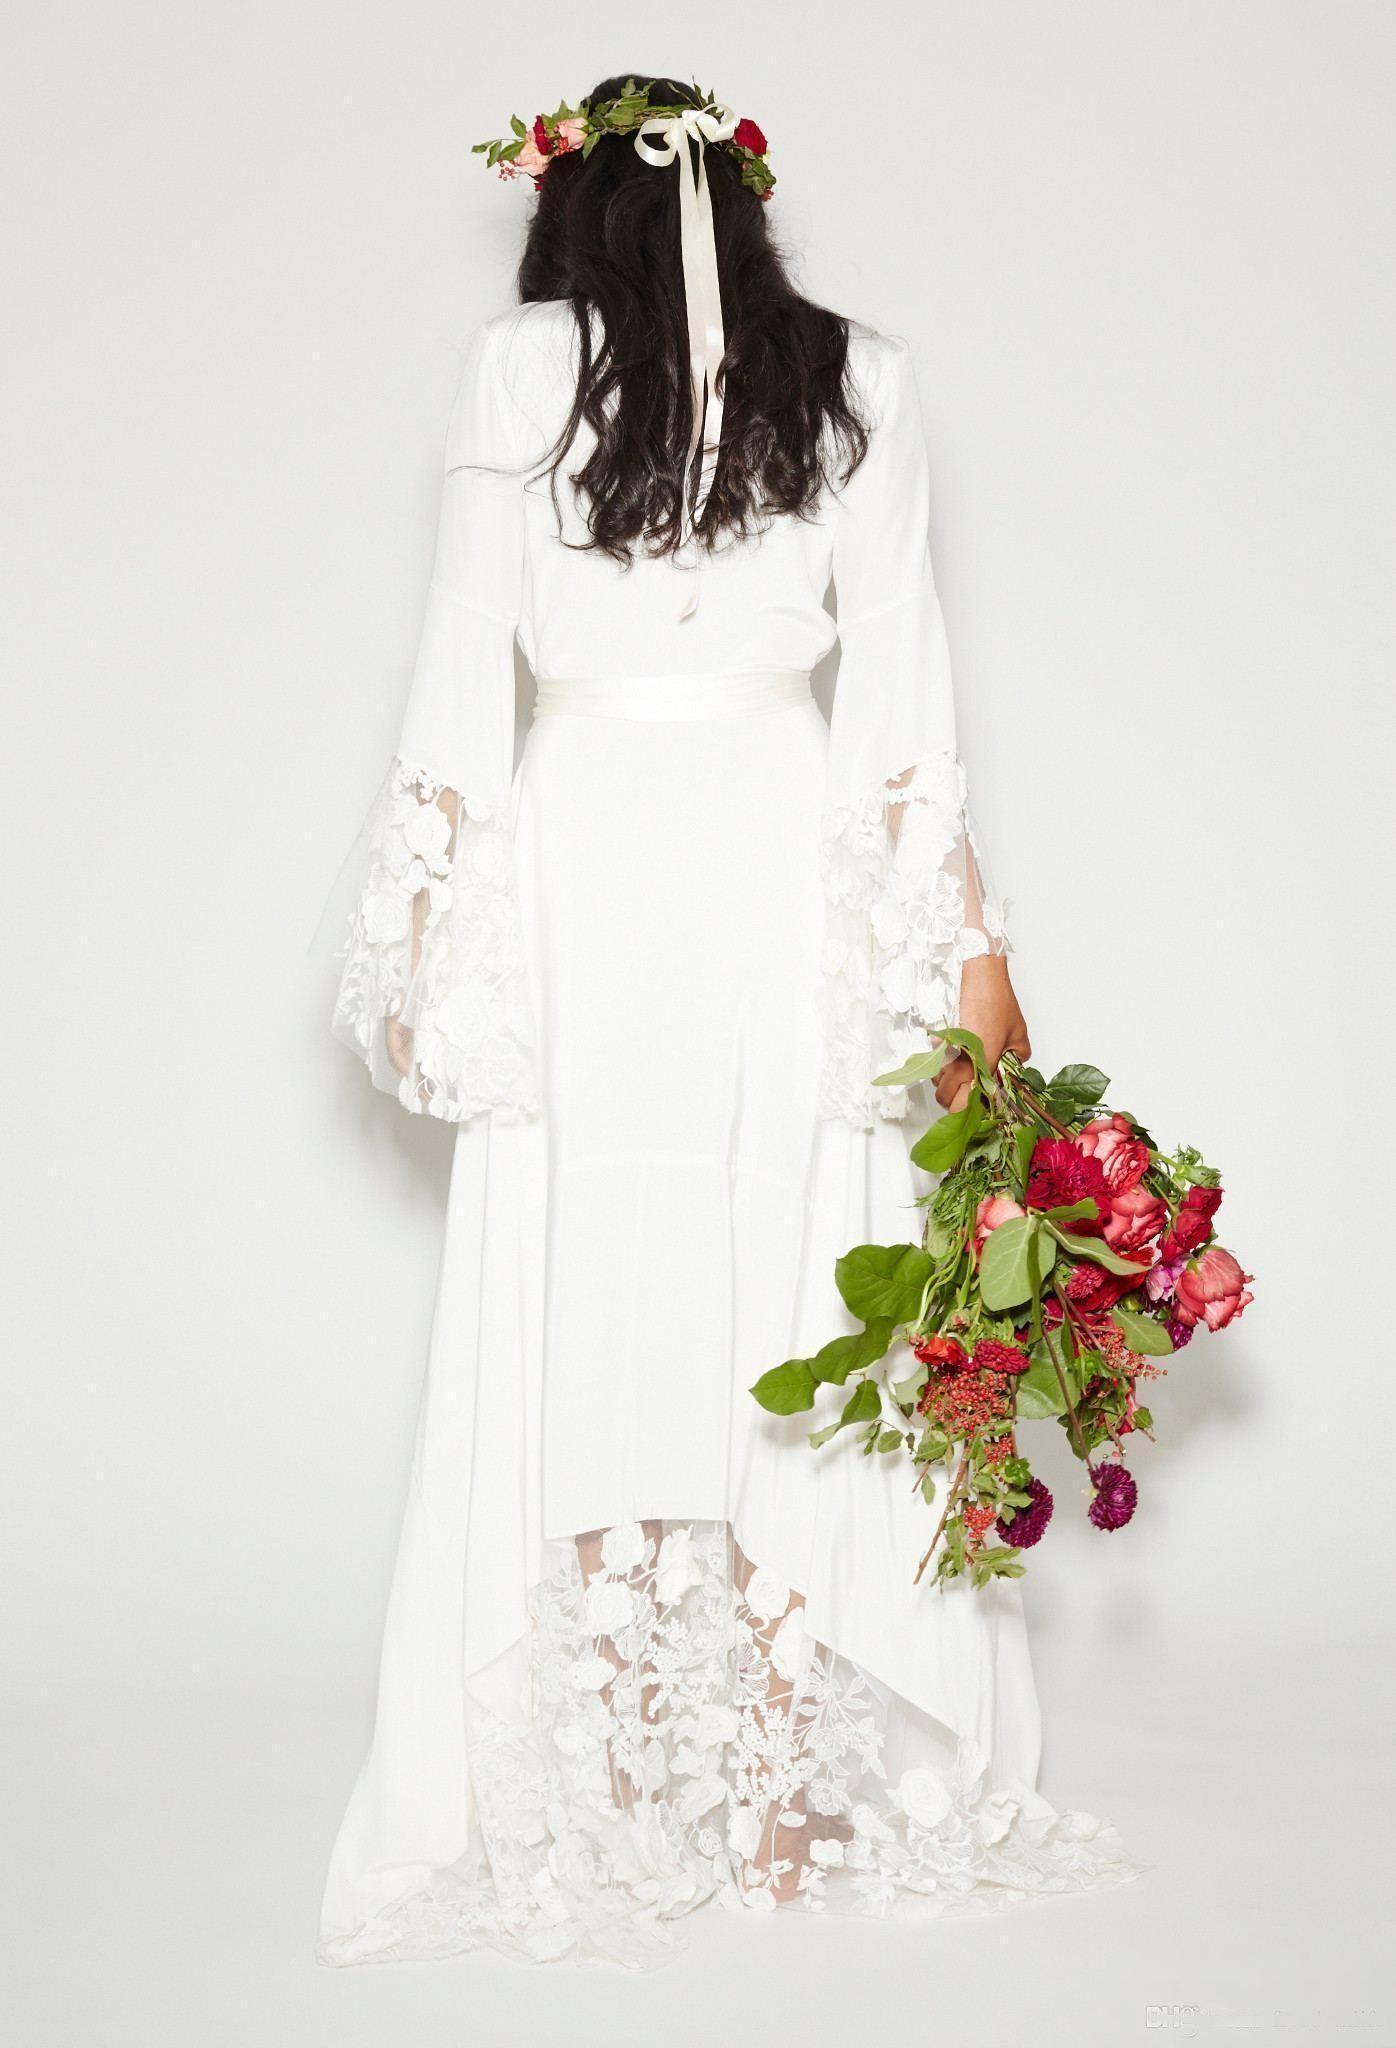 Modest Boho Beach Wedding Dresses Bohemian Long Bell Sleeve A line SexyVneck Lace Flower Bridal Gowns Plus Size Custom made